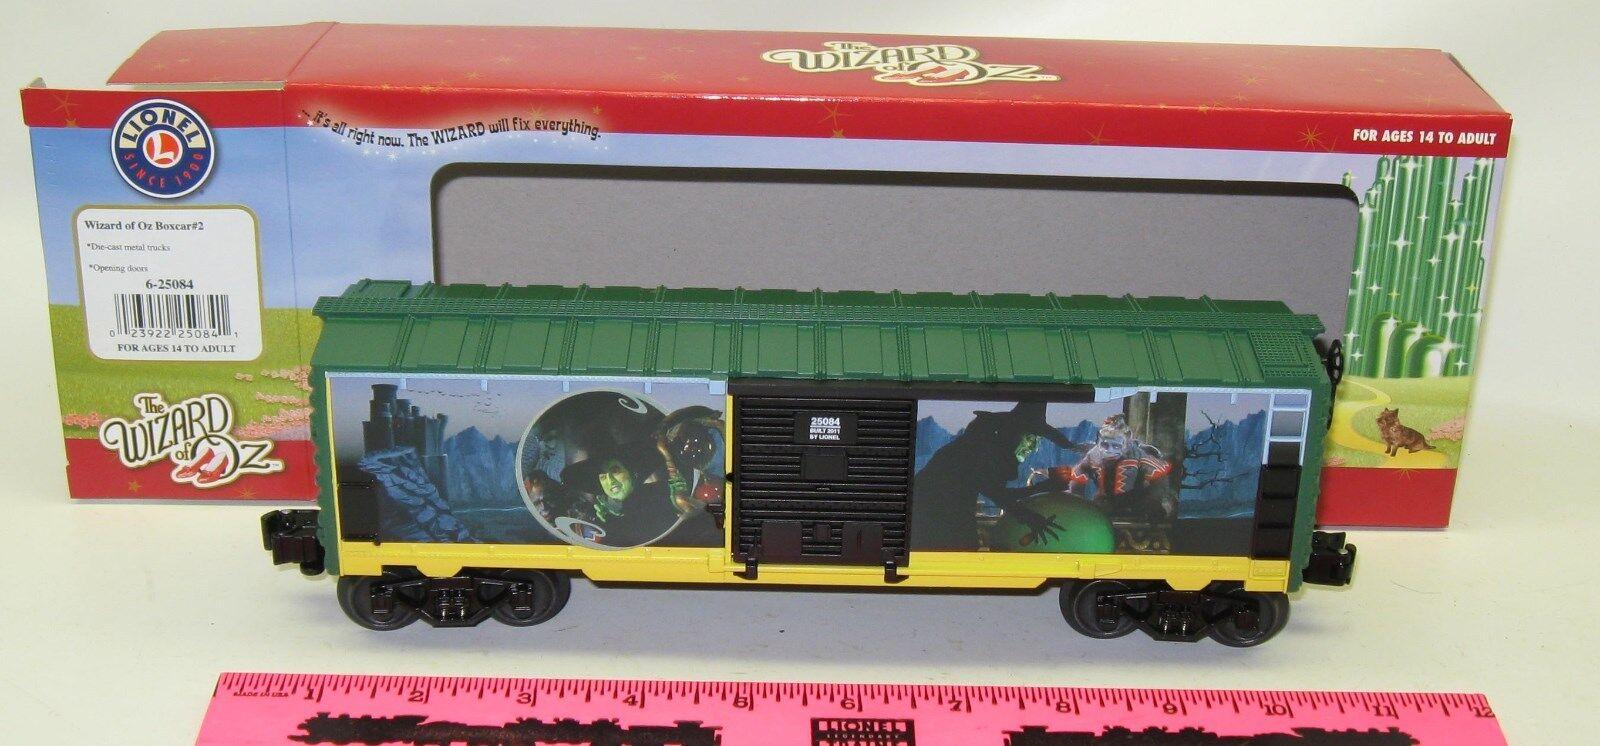 New Lionel 6-25084 Wizard of Oz boxcar